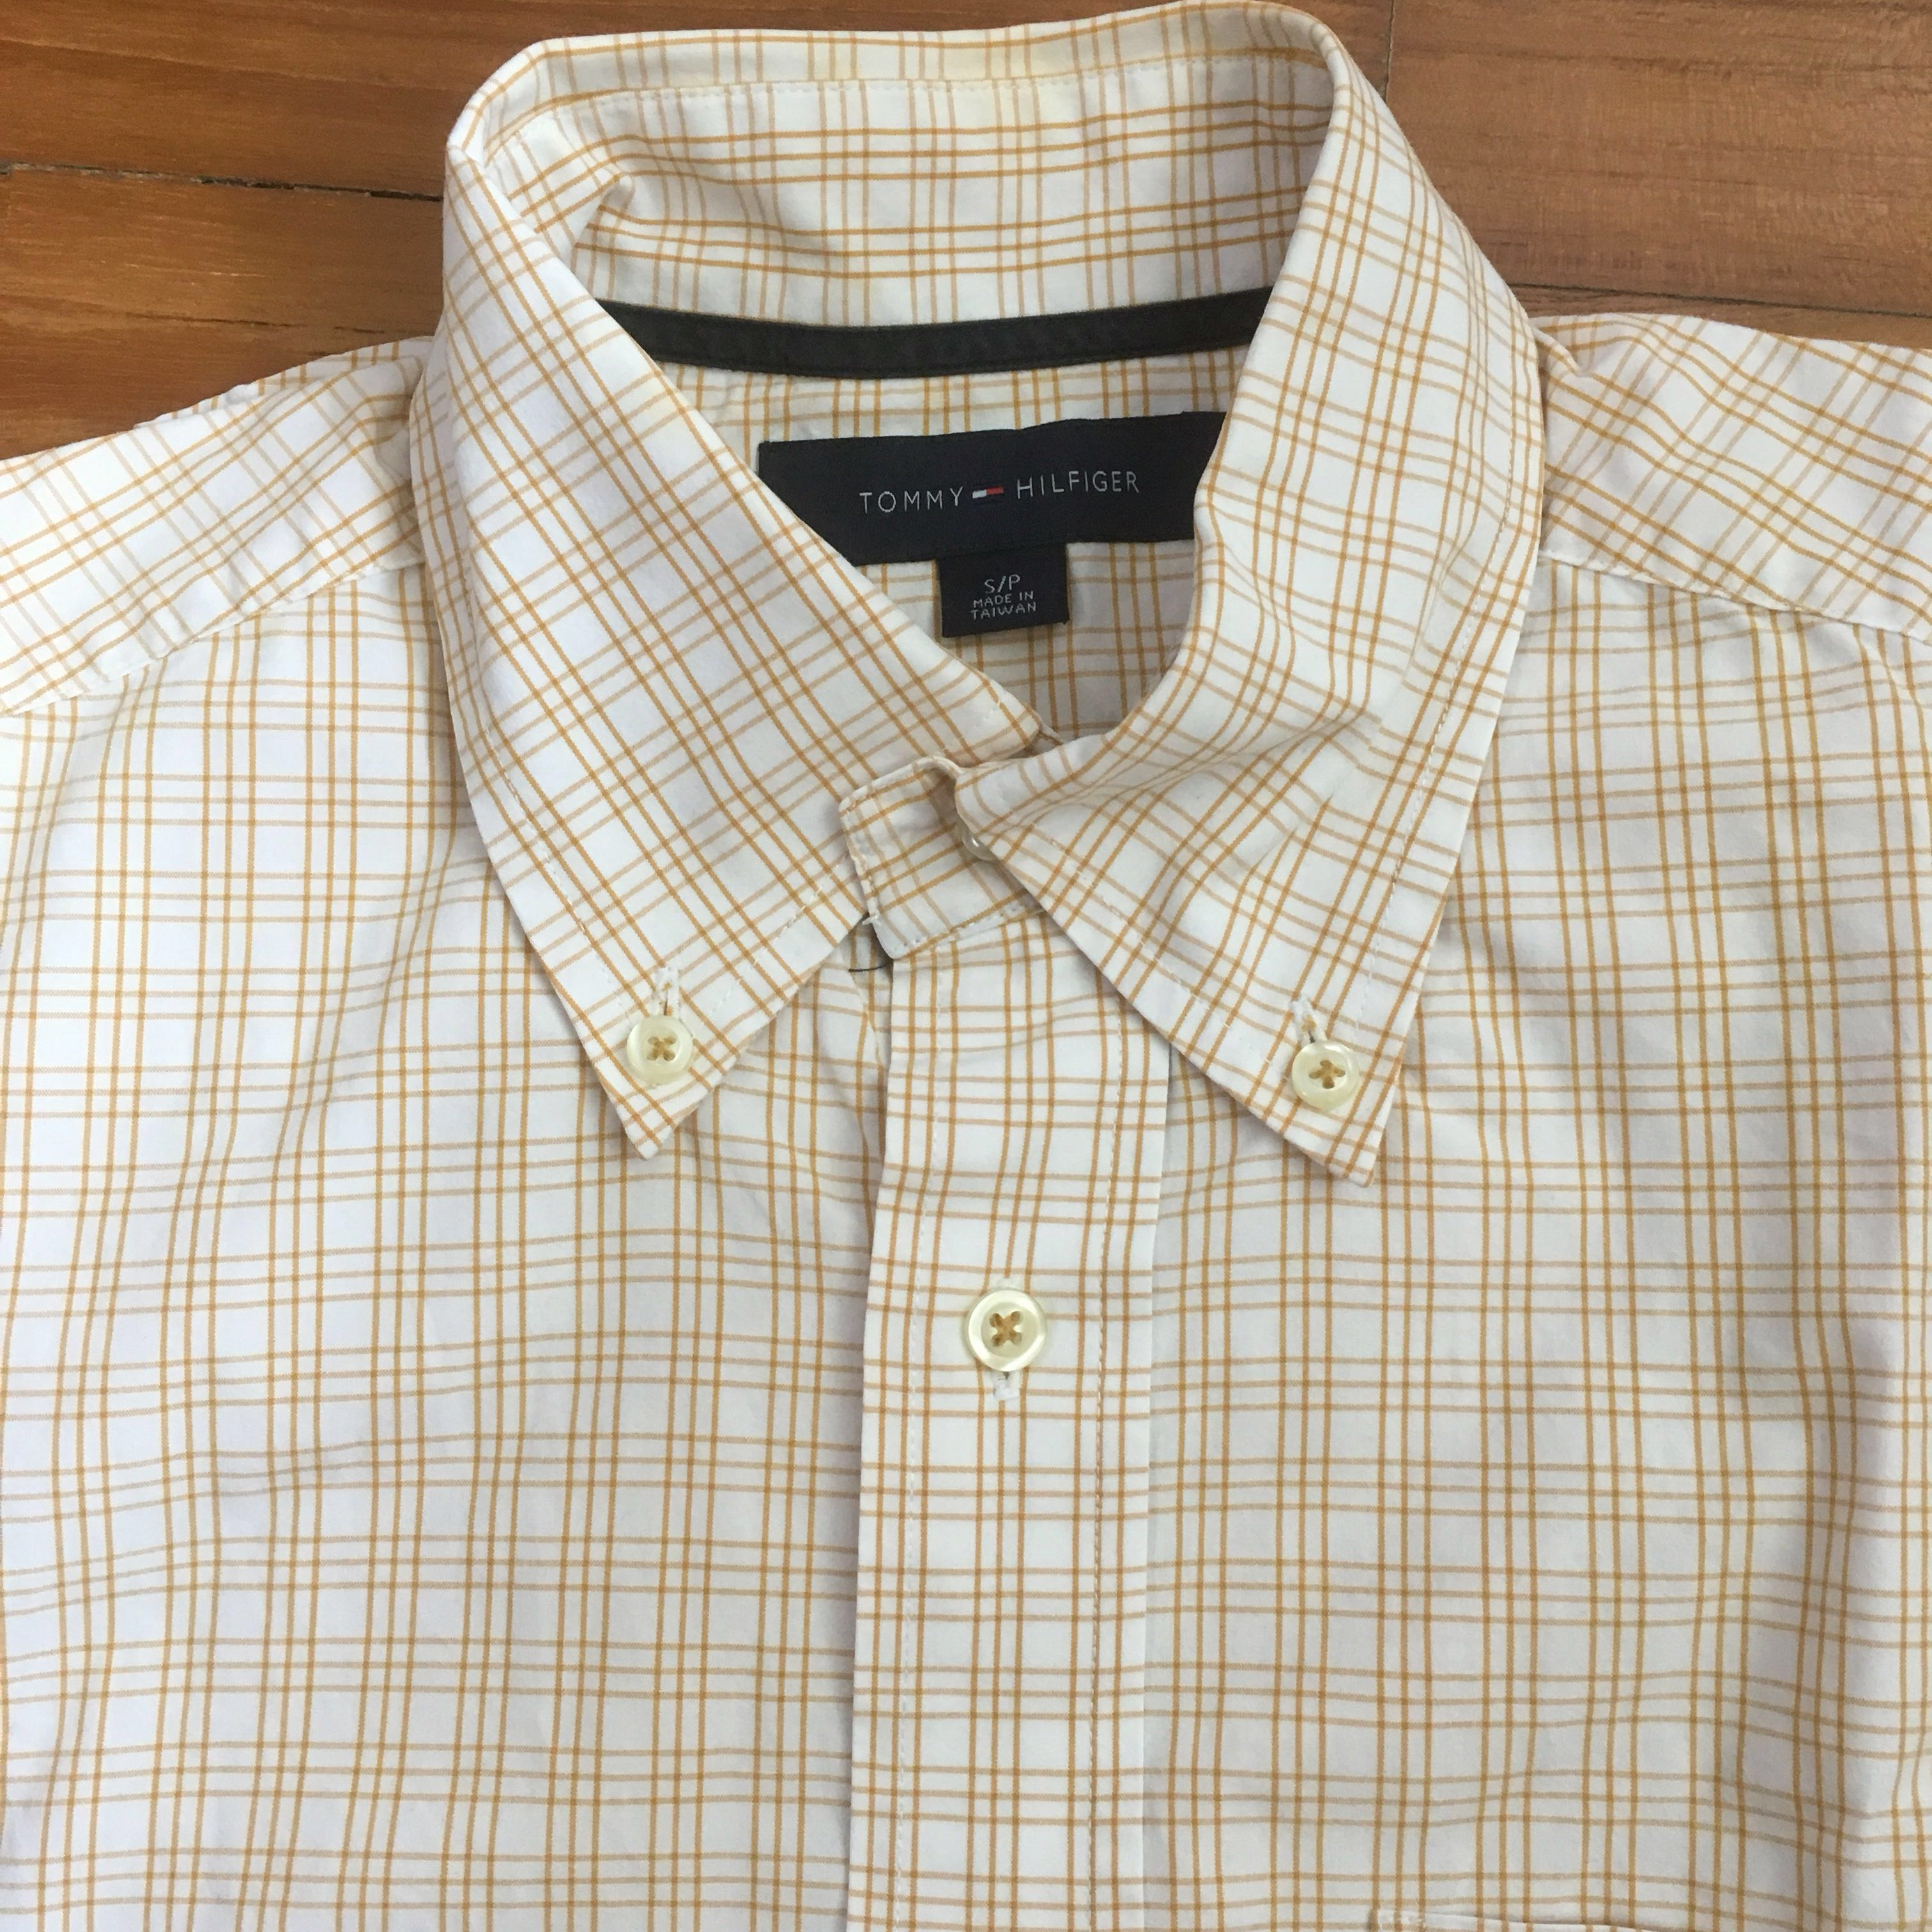 6f8ea88b2 Tommy Hilfiger Men Shirt Office Work Collar Short Sleeve, Men's ...